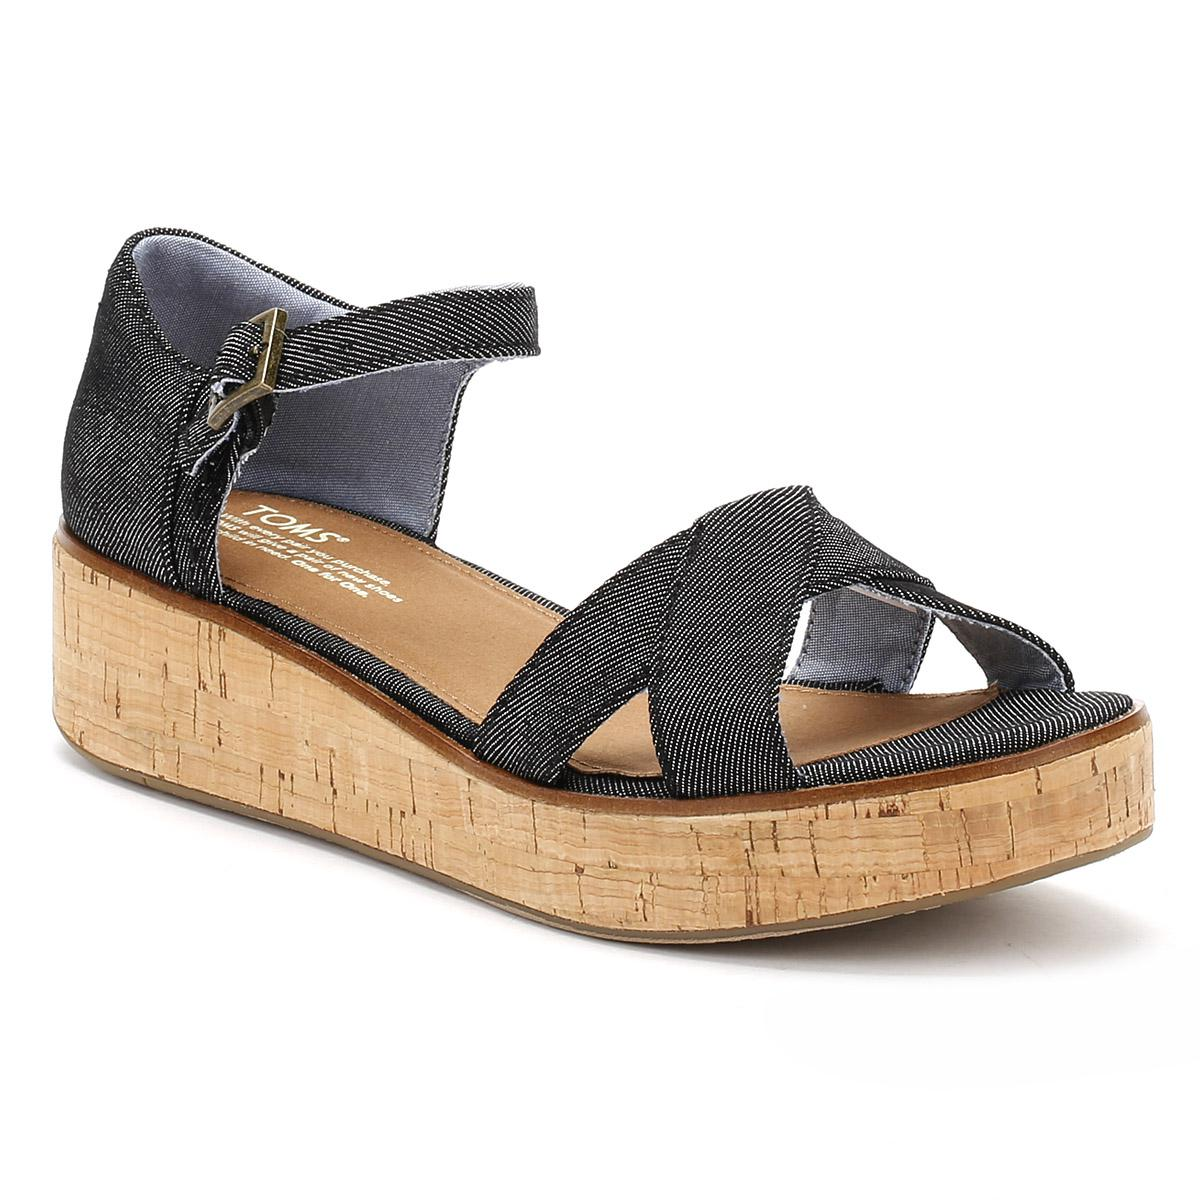 0680a054663 TOMS Womens Black Denim Harper Platform Wedge Sandals in Black - Lyst